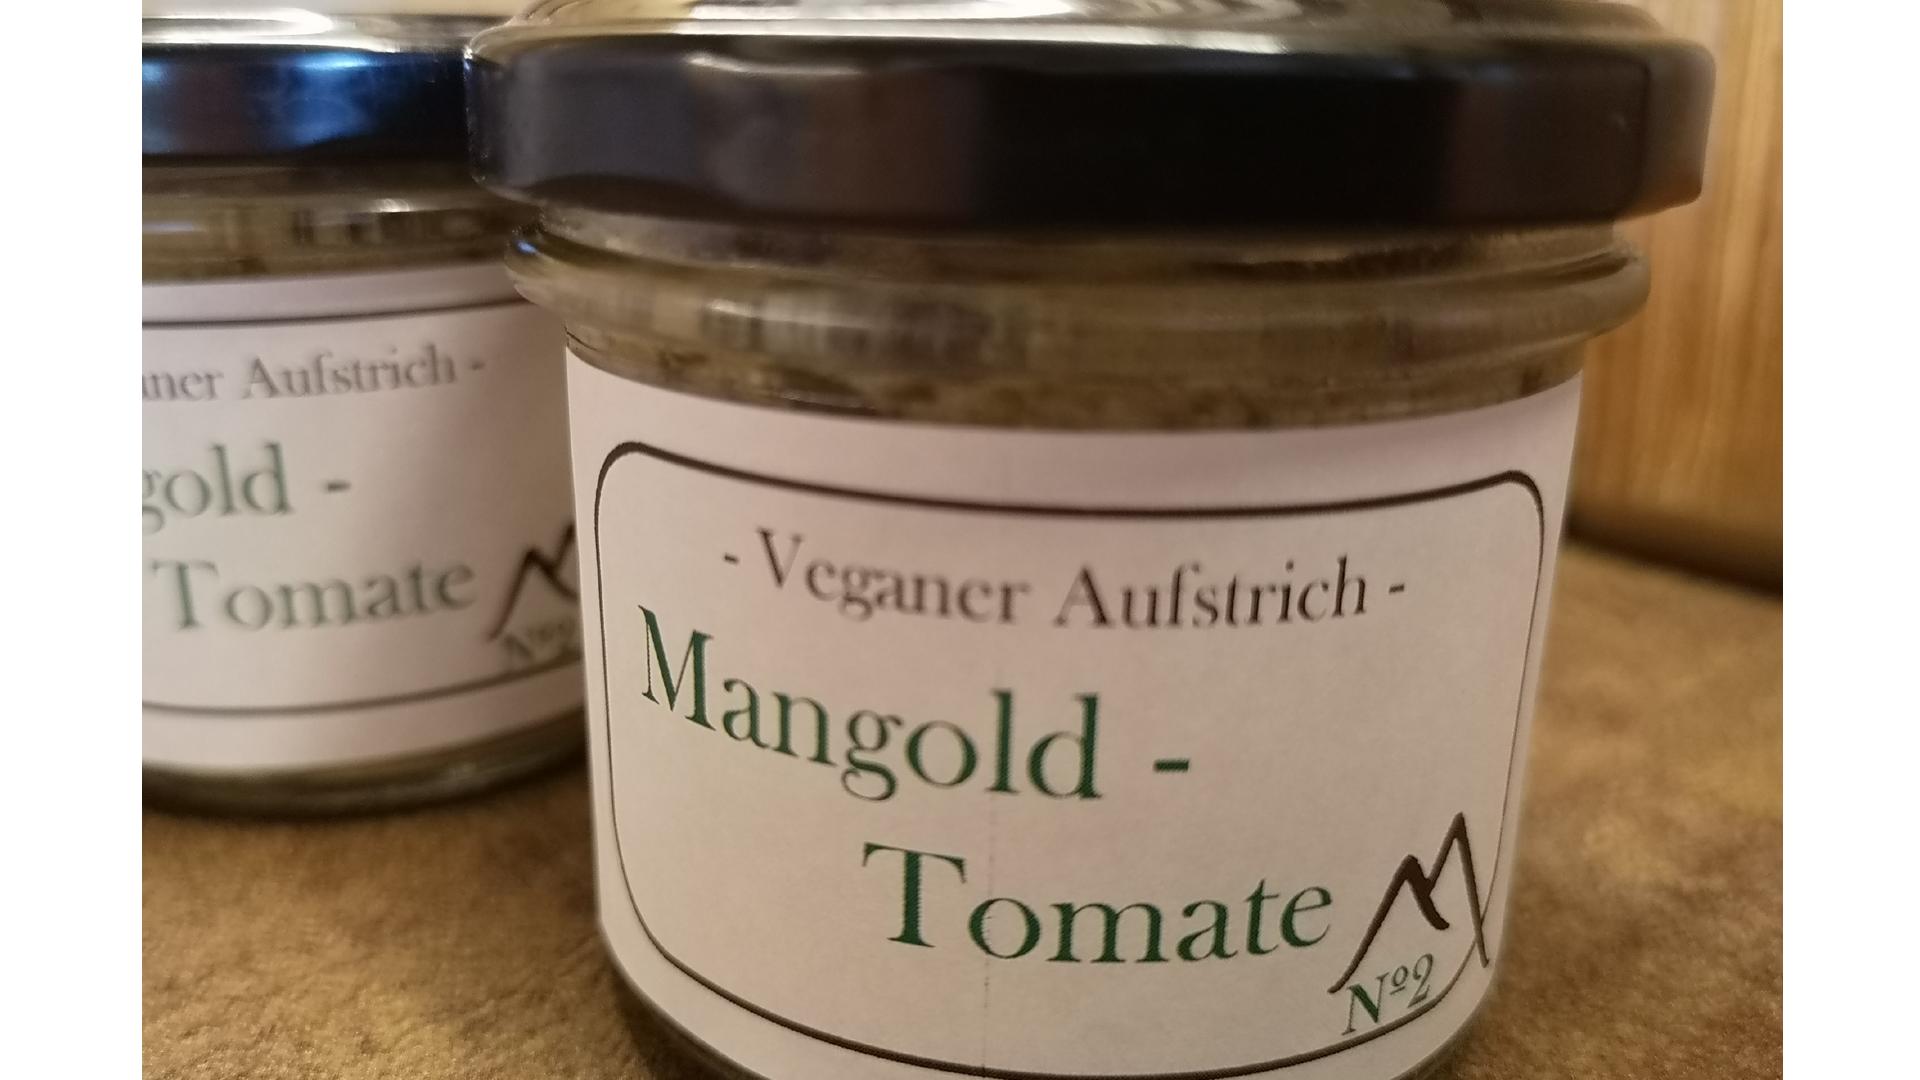 Mangold - Tomate N°2 - 100gr.